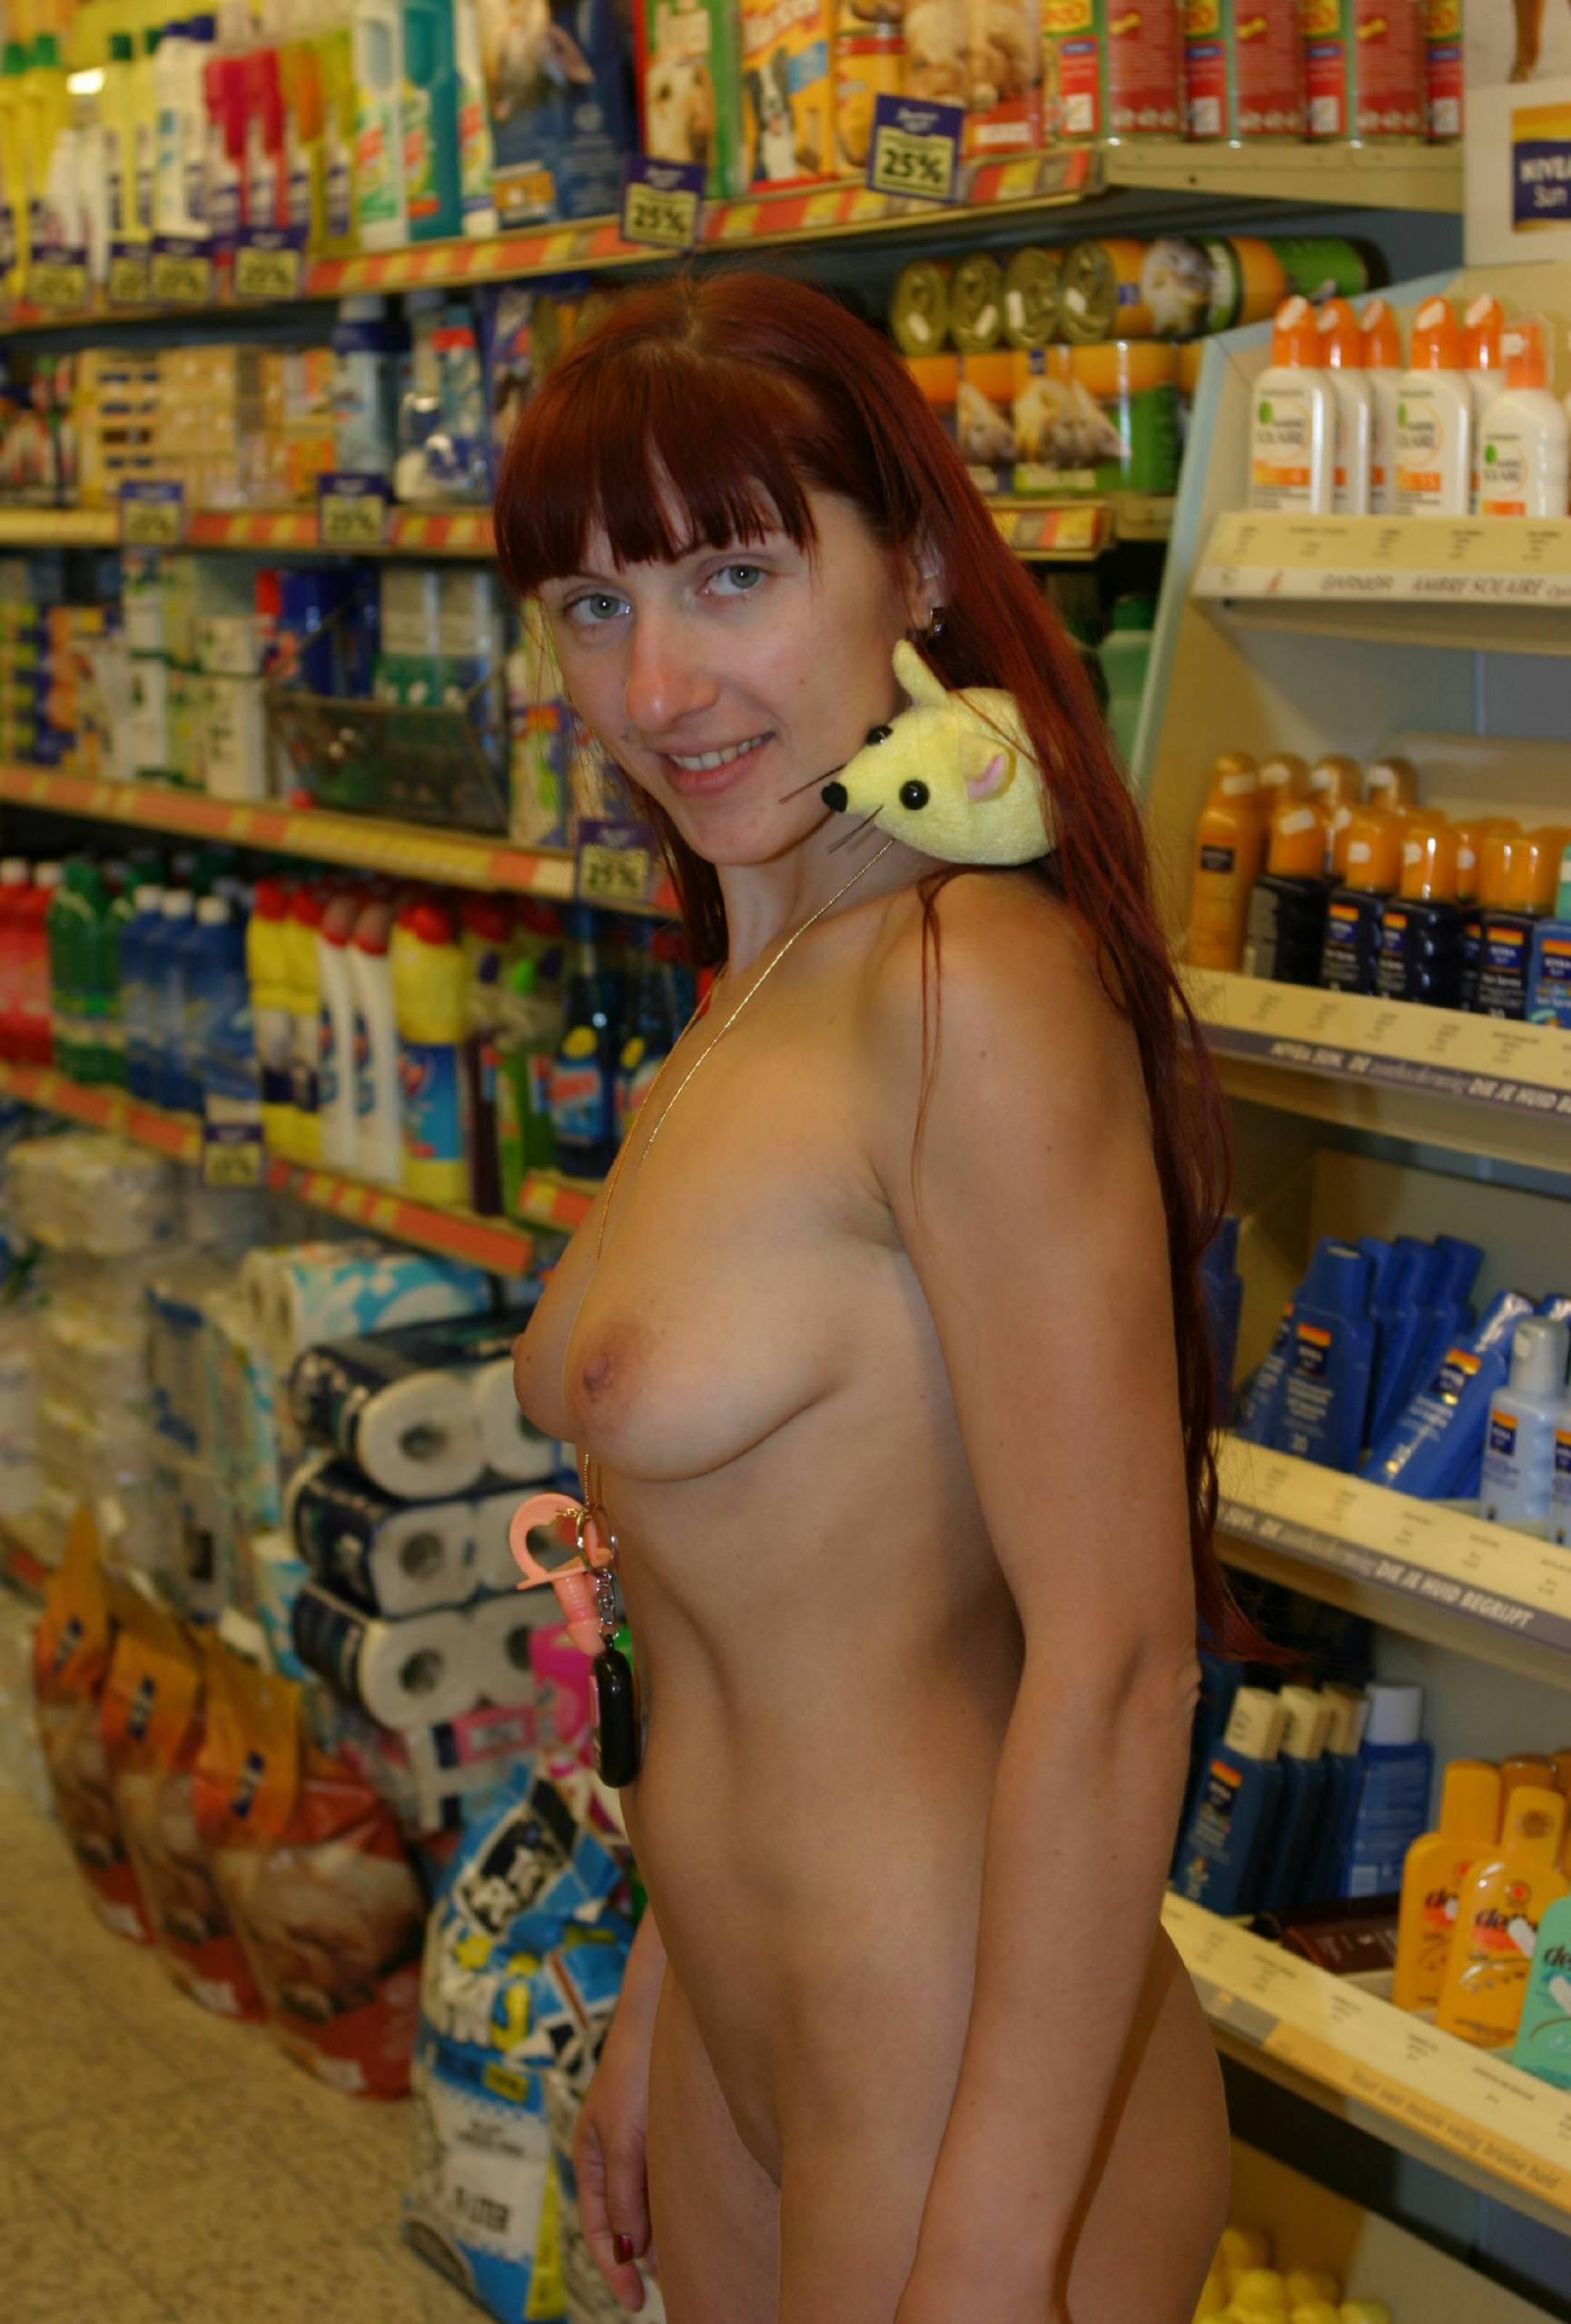 Nudist Photos Holland Store Shopping - 1